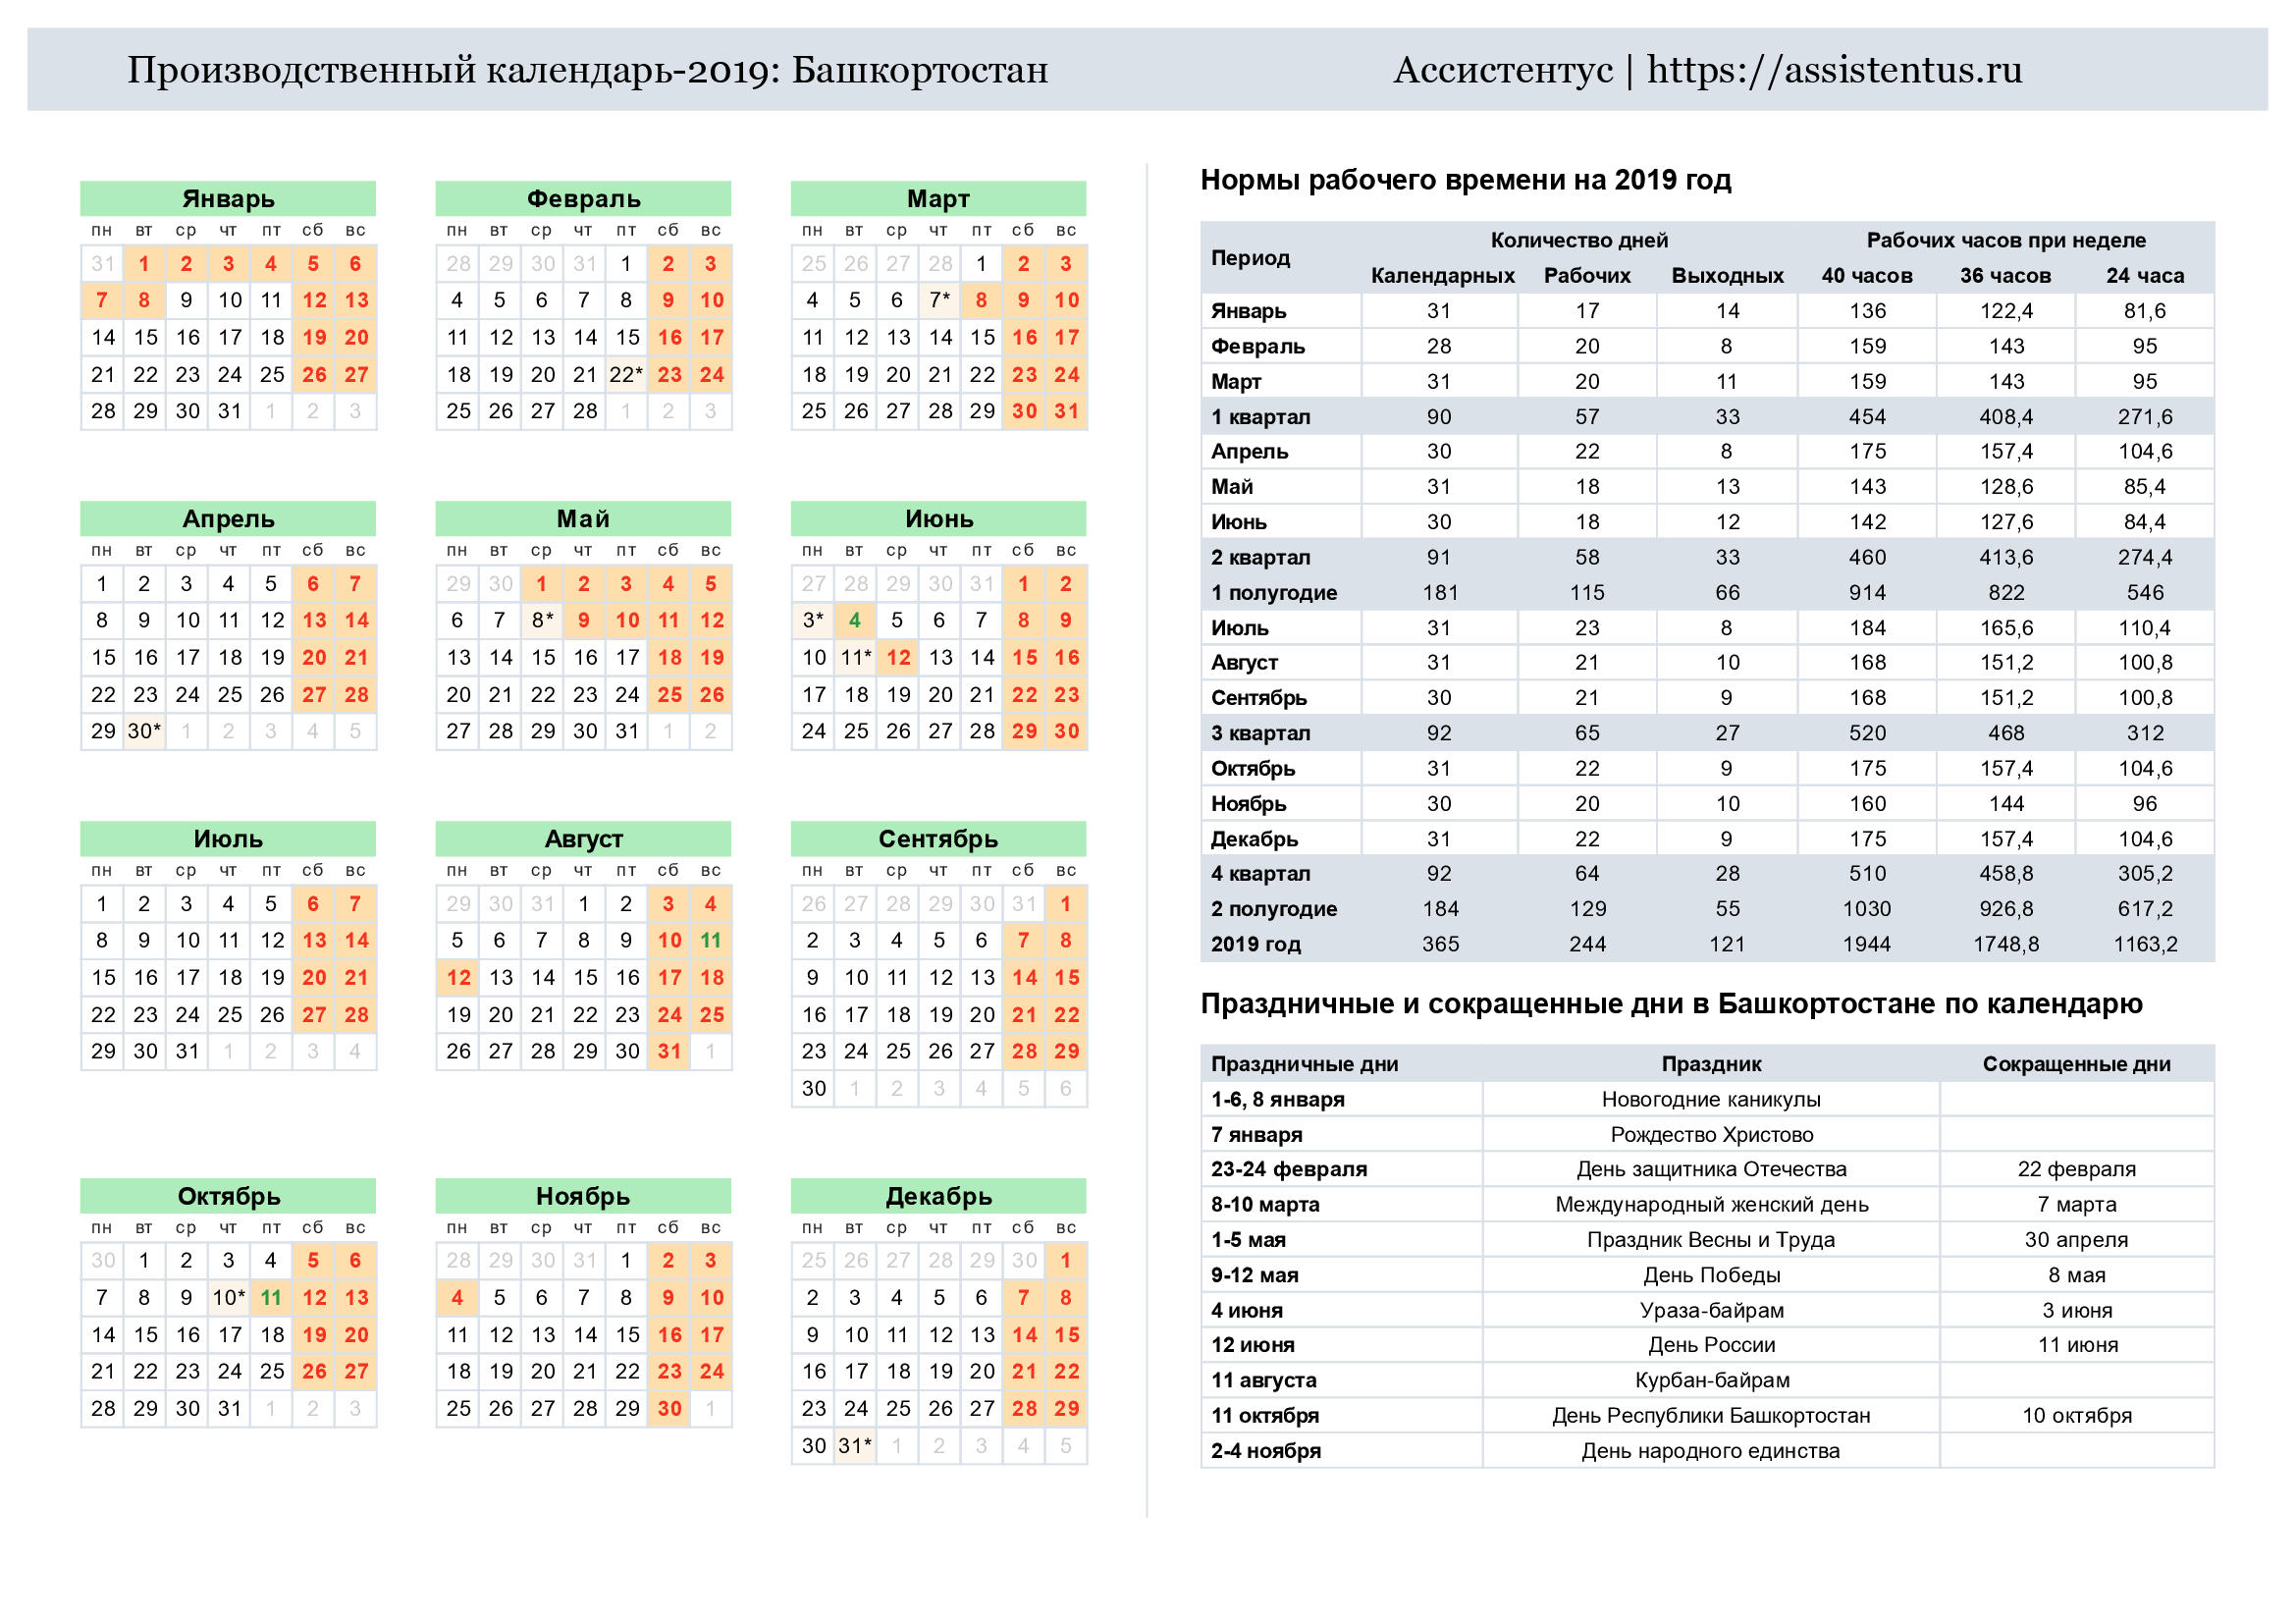 Производственный календарь 2019, Башкортостан